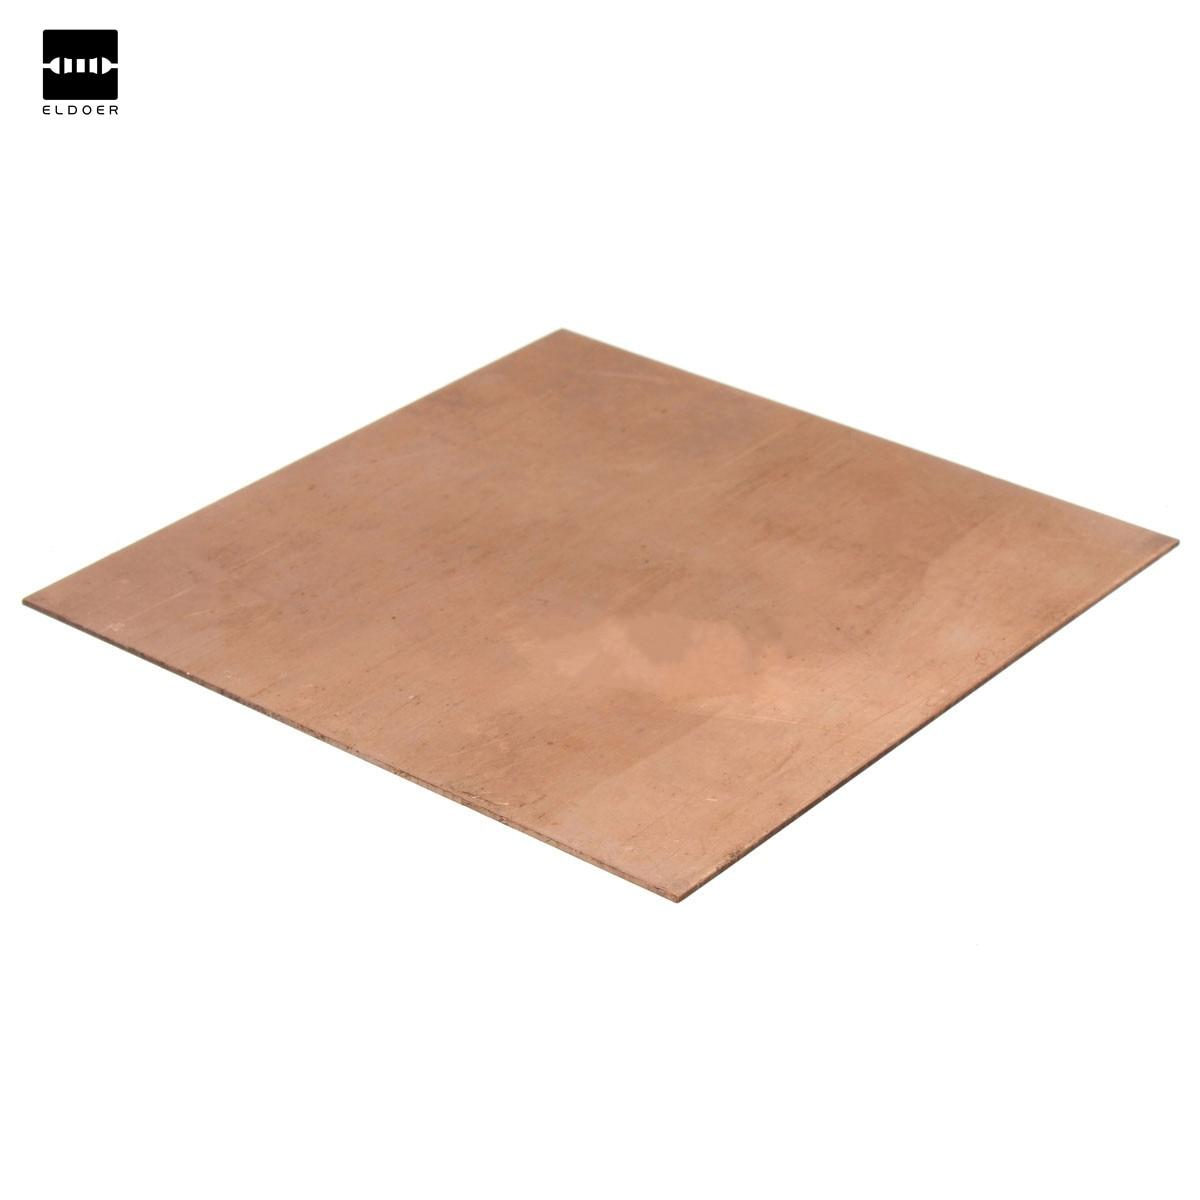 2016 Hot Sale 99.9% Pure Copper Cu Metal Guillotine Cut Sheet Plate 1mm*100mm*100mm Safe Using Wholesale Price